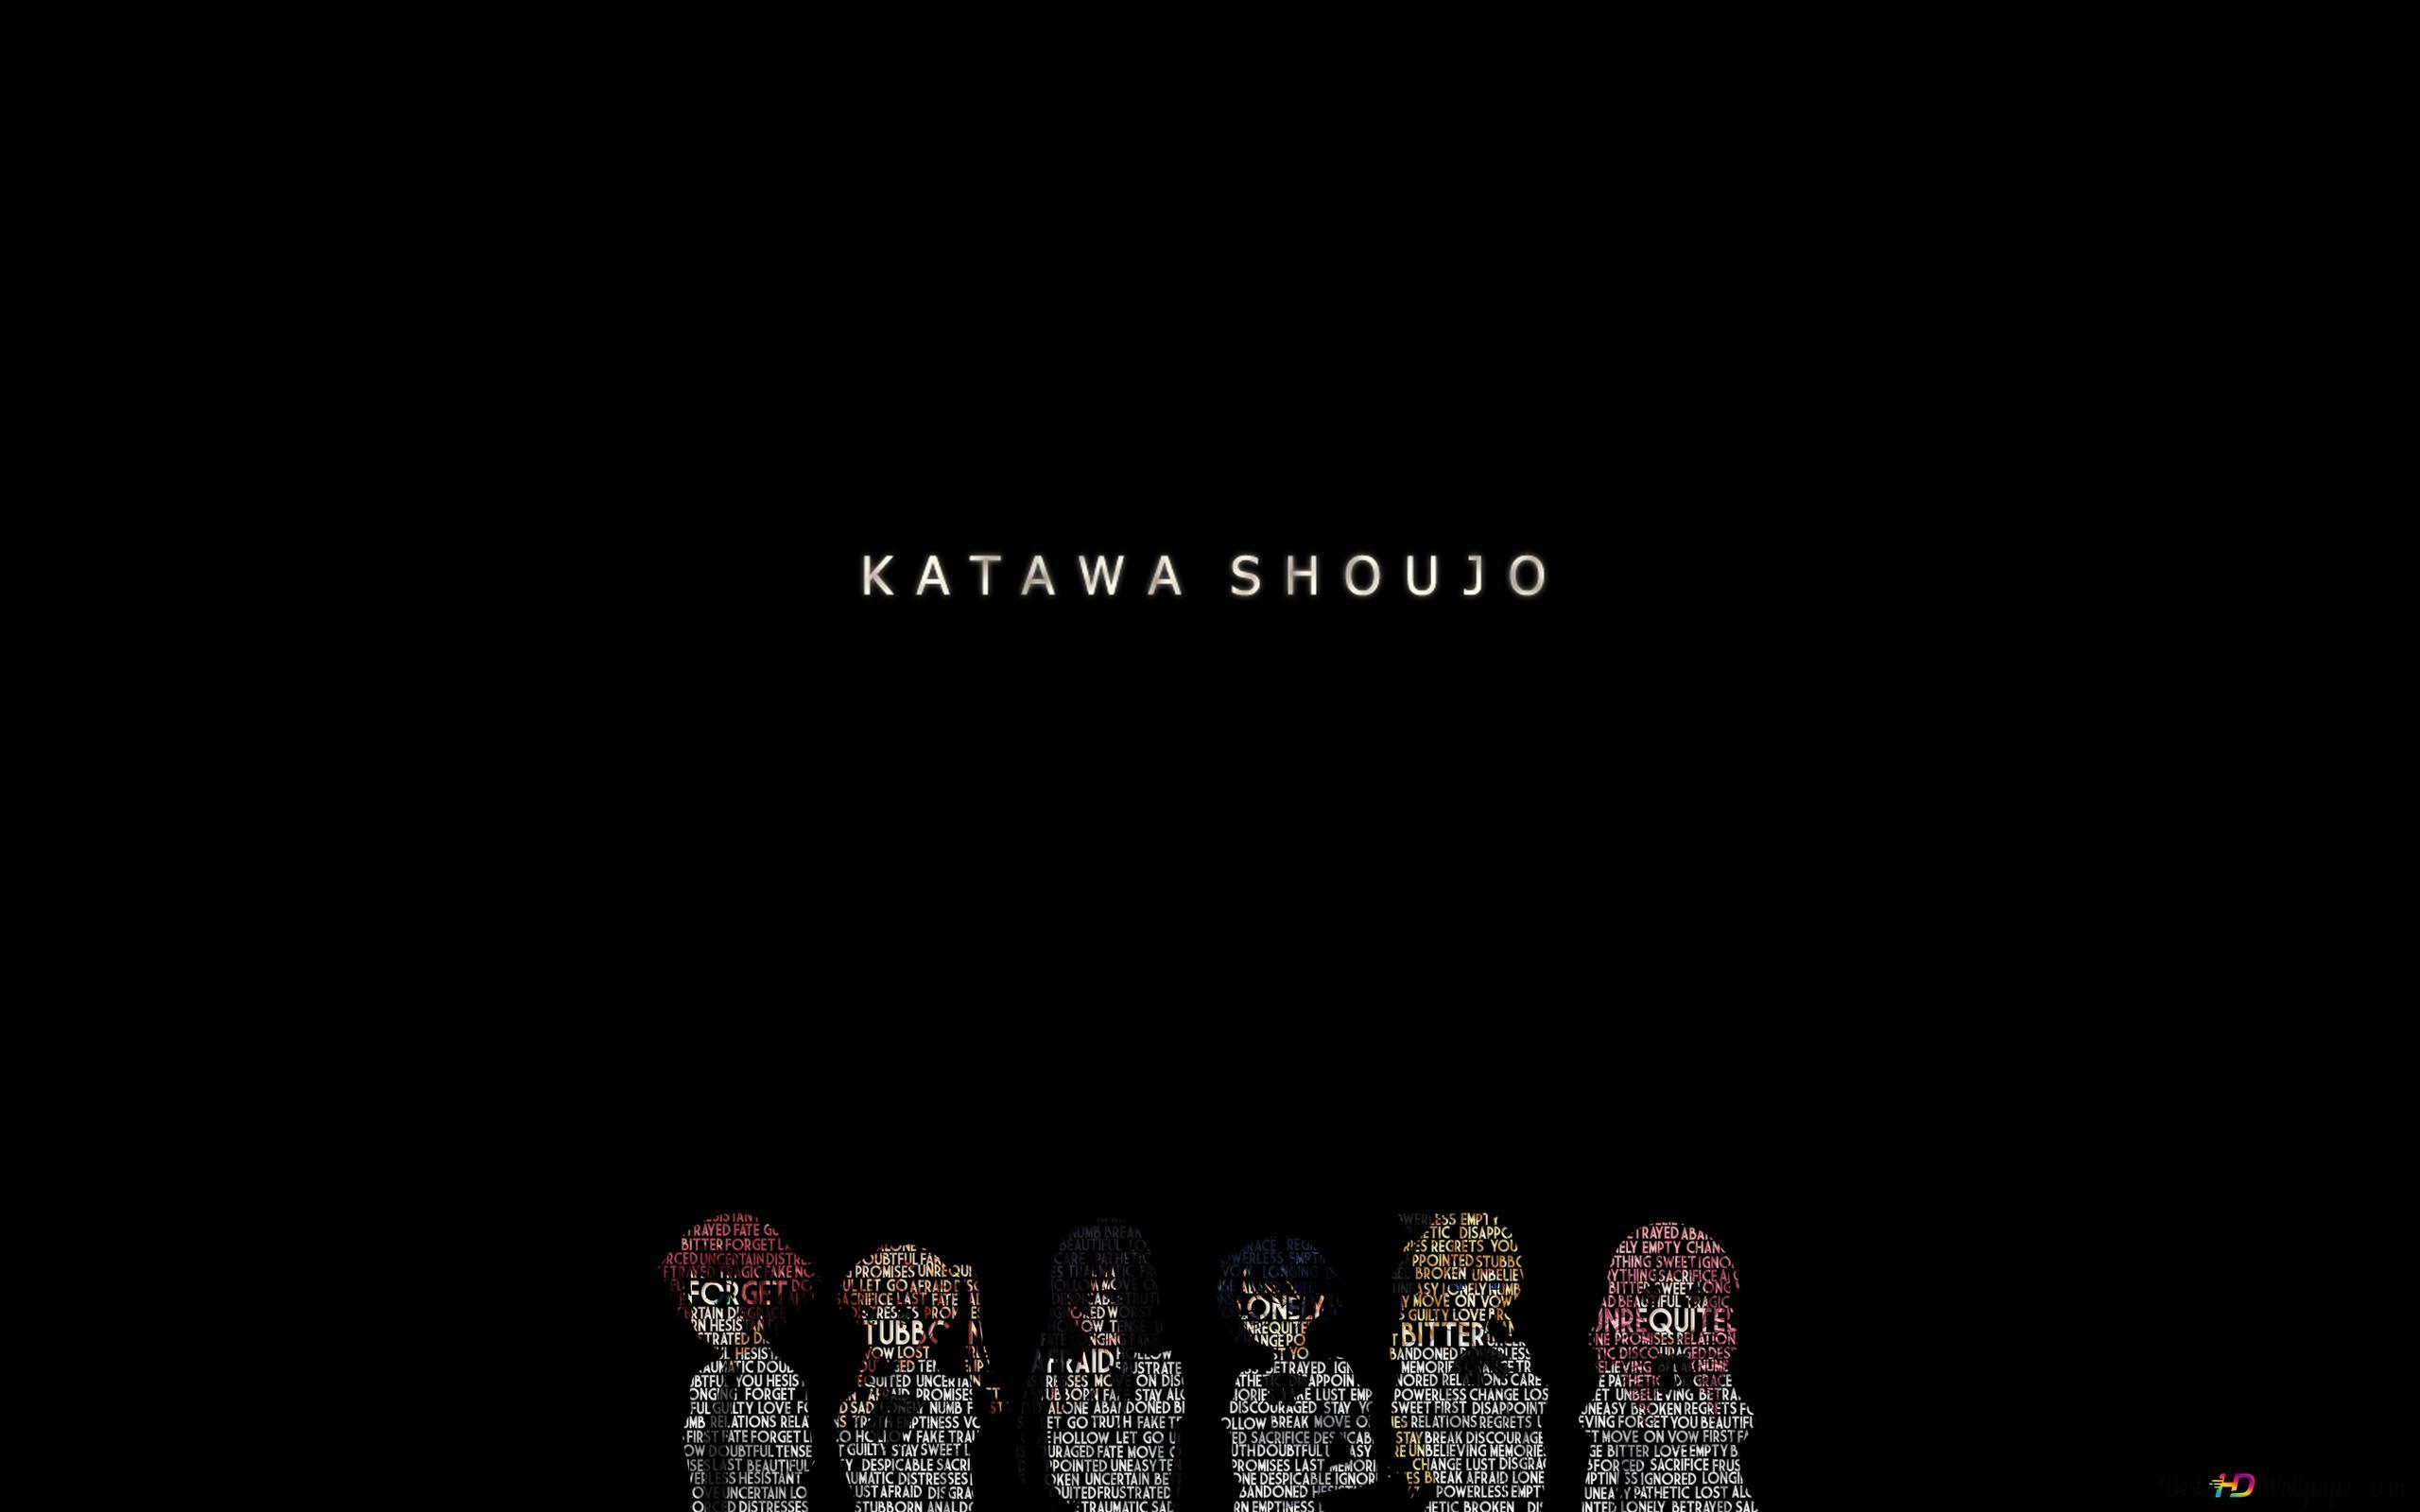 Katawa少女 Hd壁紙のダウンロード